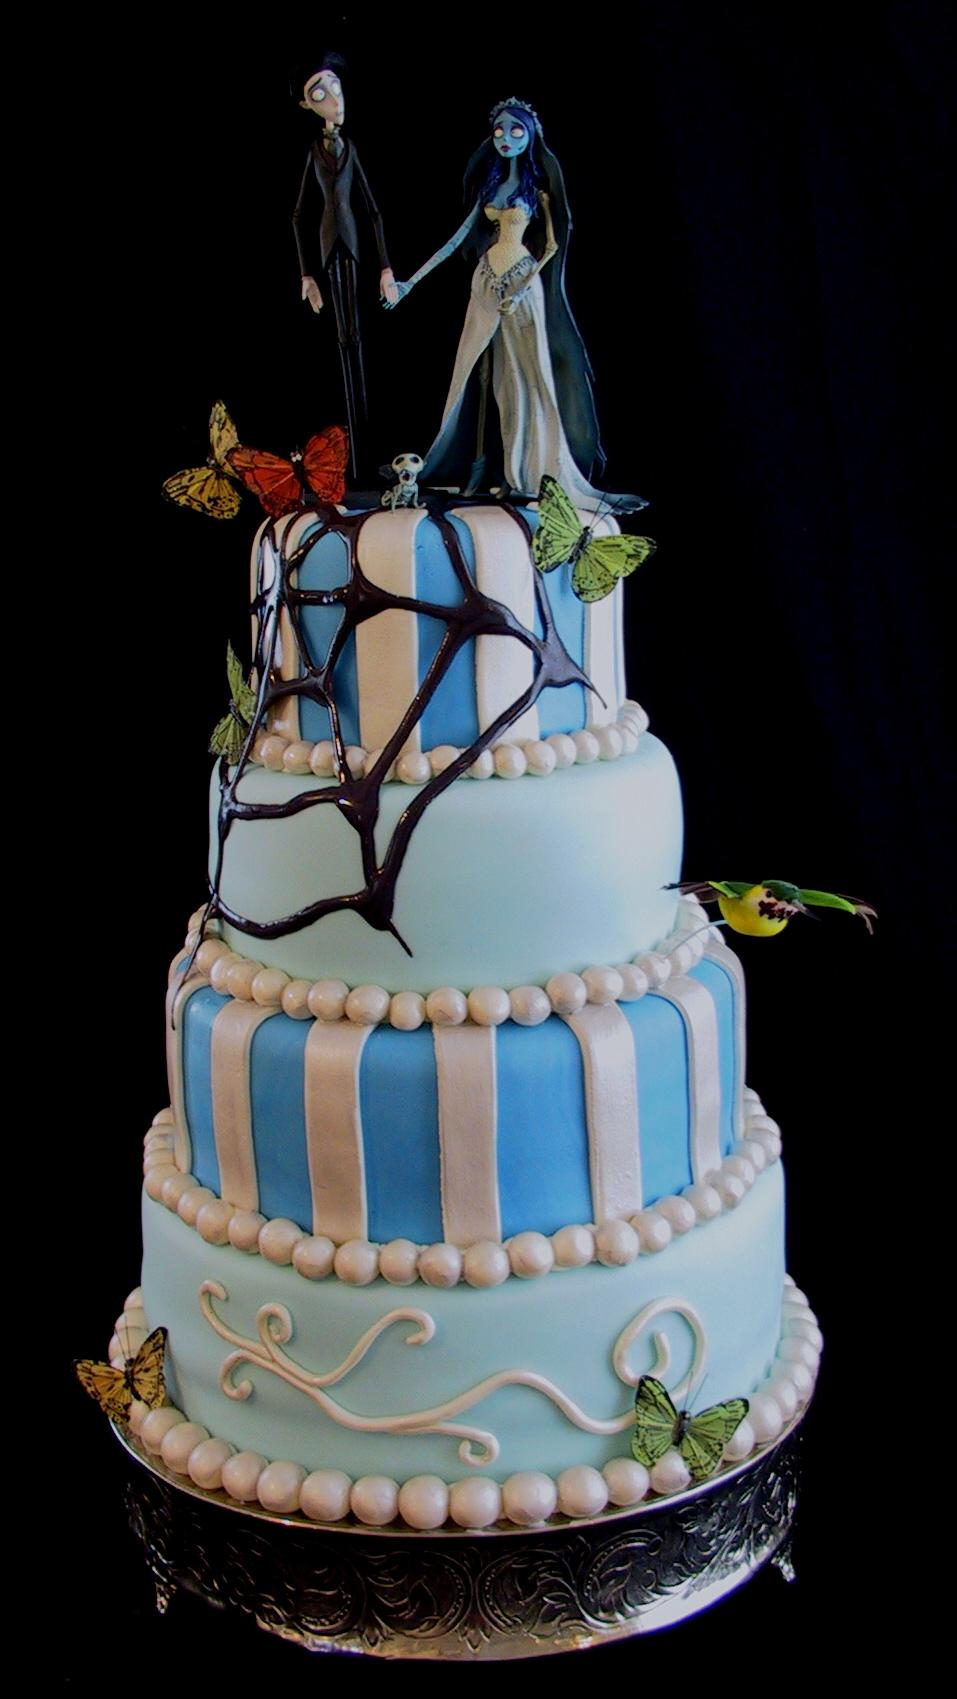 Corpse Bride Wedding Cake Corpse Bride Photo 32415231